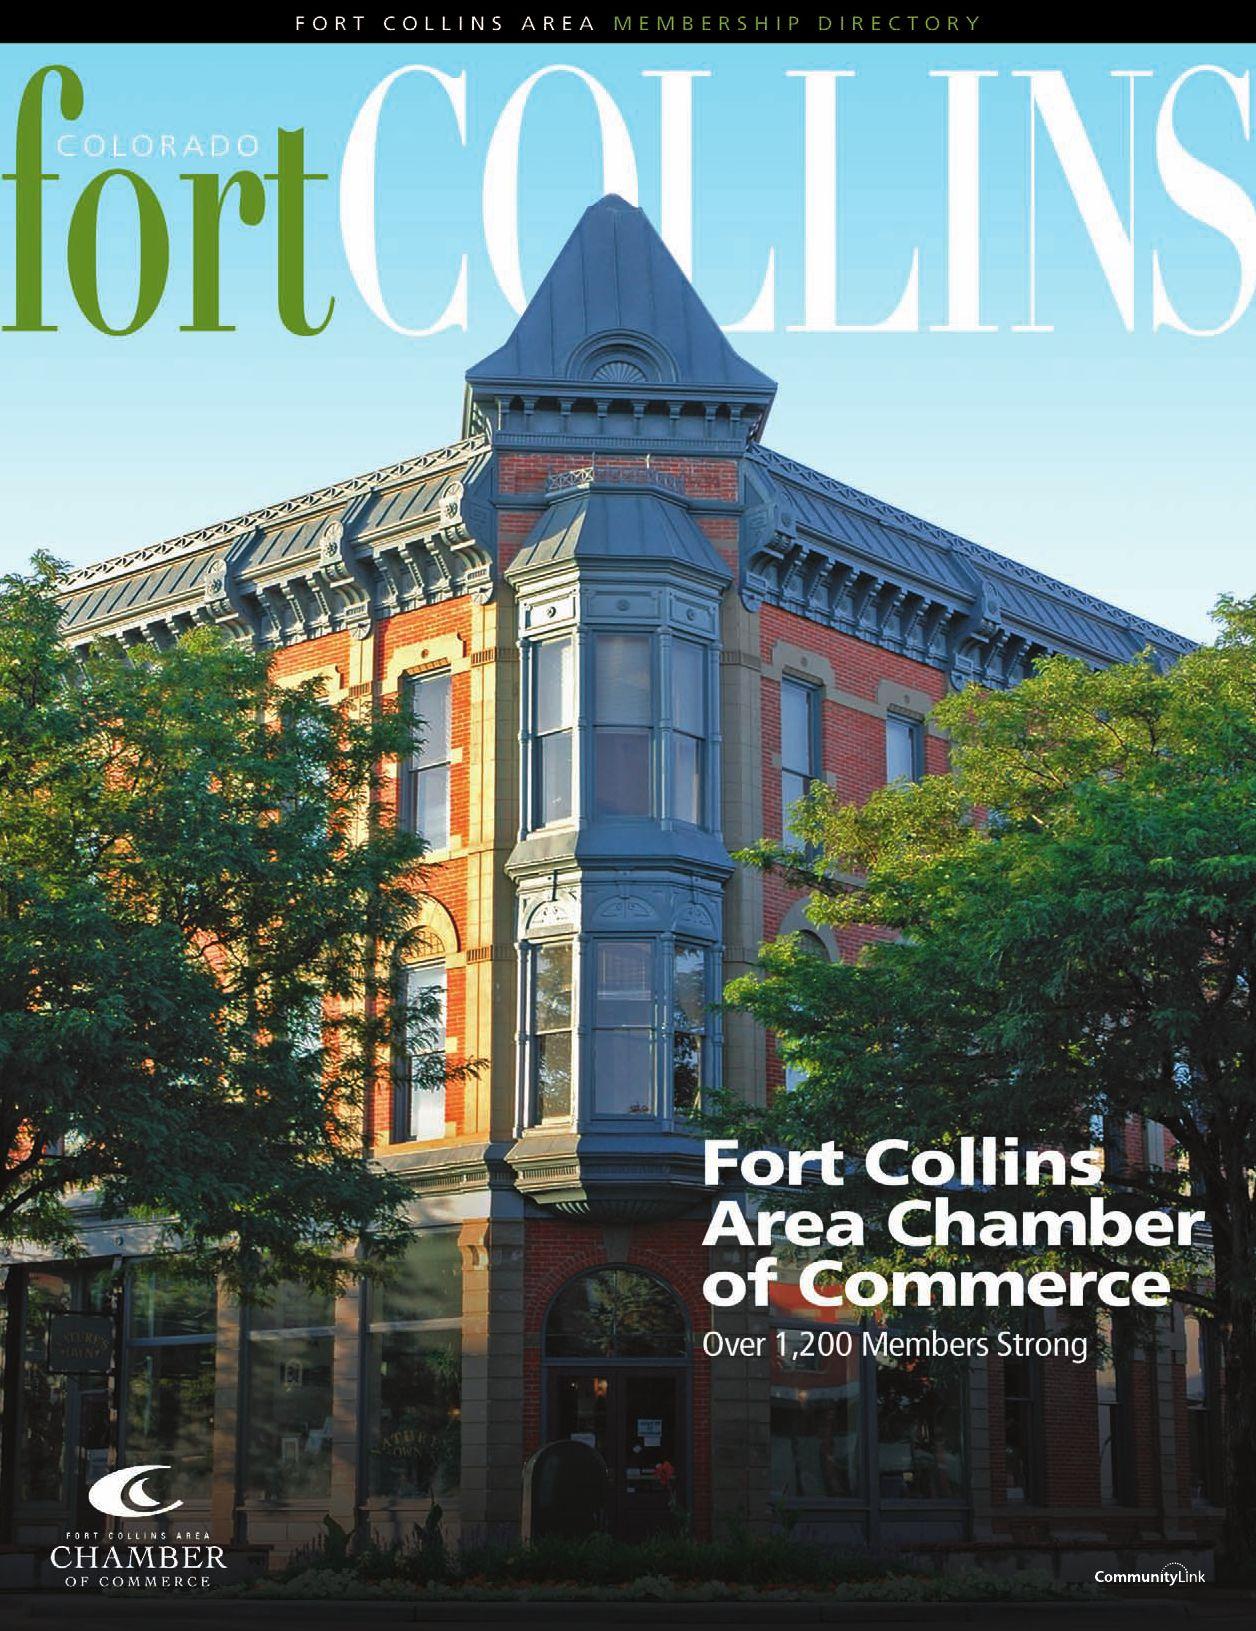 Fort Collins CO 2009 Membership Directory by Tivoli Design Media